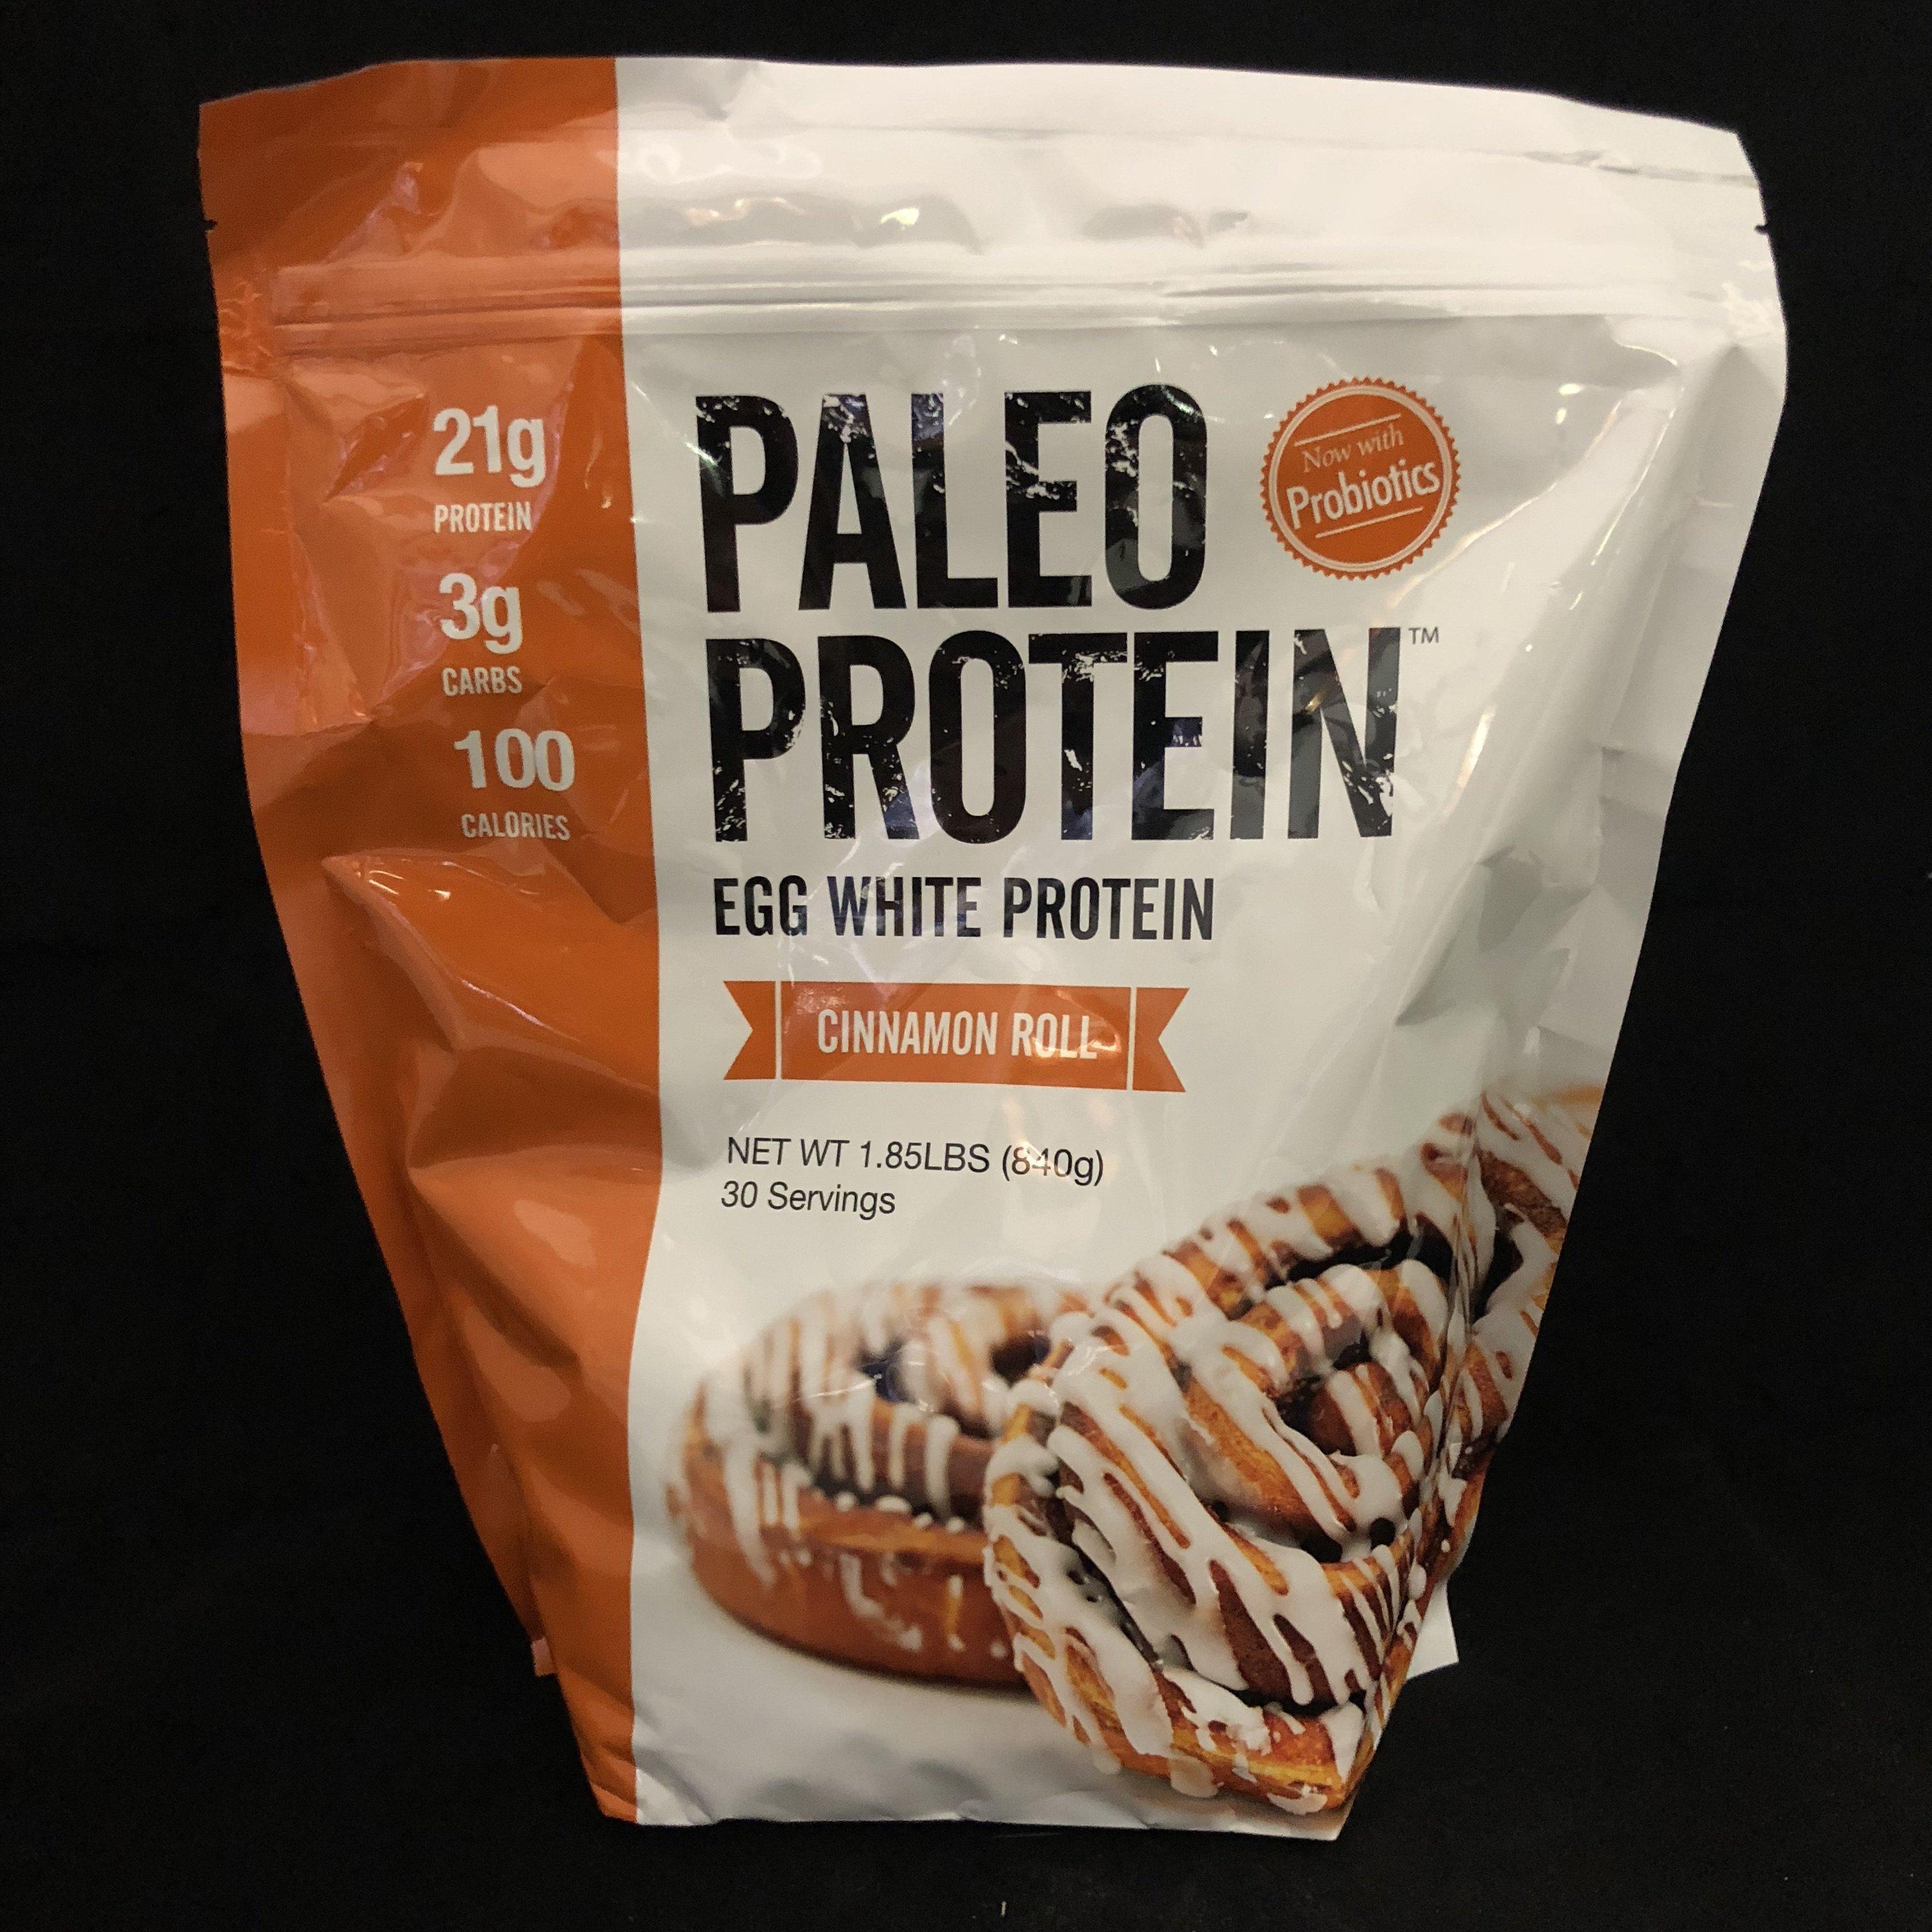 Paleo Protein Cinnamon Roll 813926004188